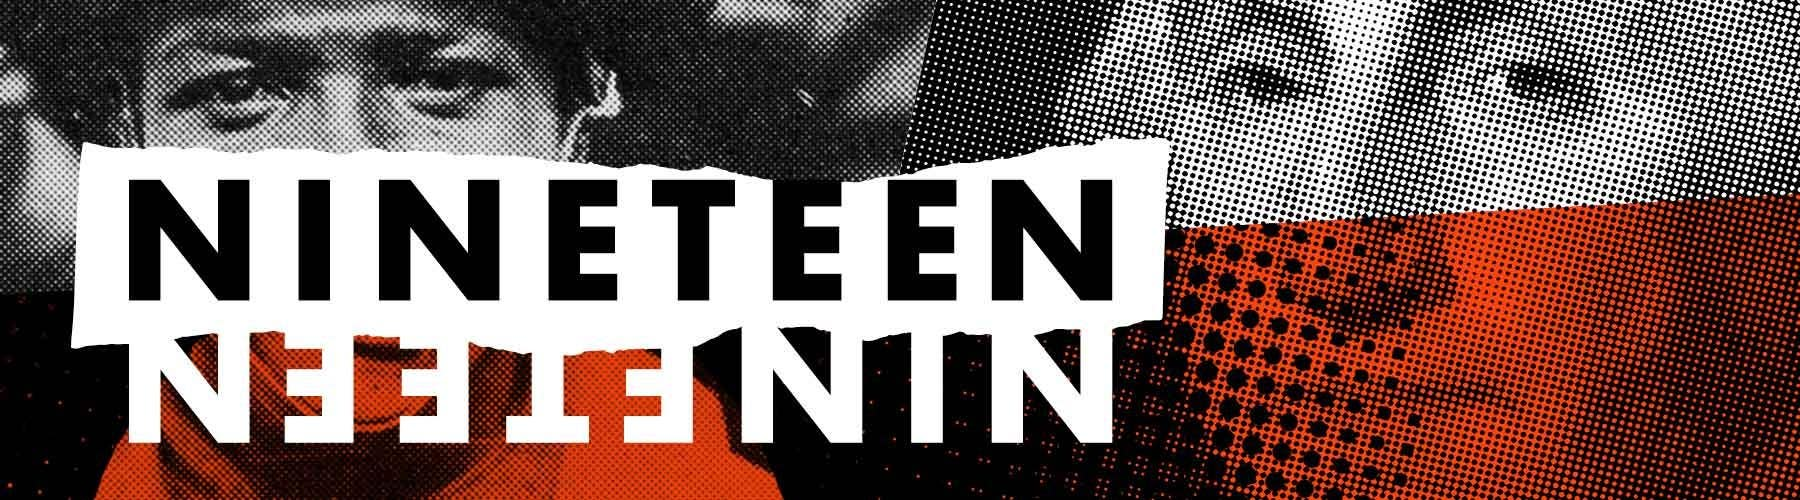 """Nineteen Nineteen"" at The Huntington Library, Art Museum, and Botanical Gardens"